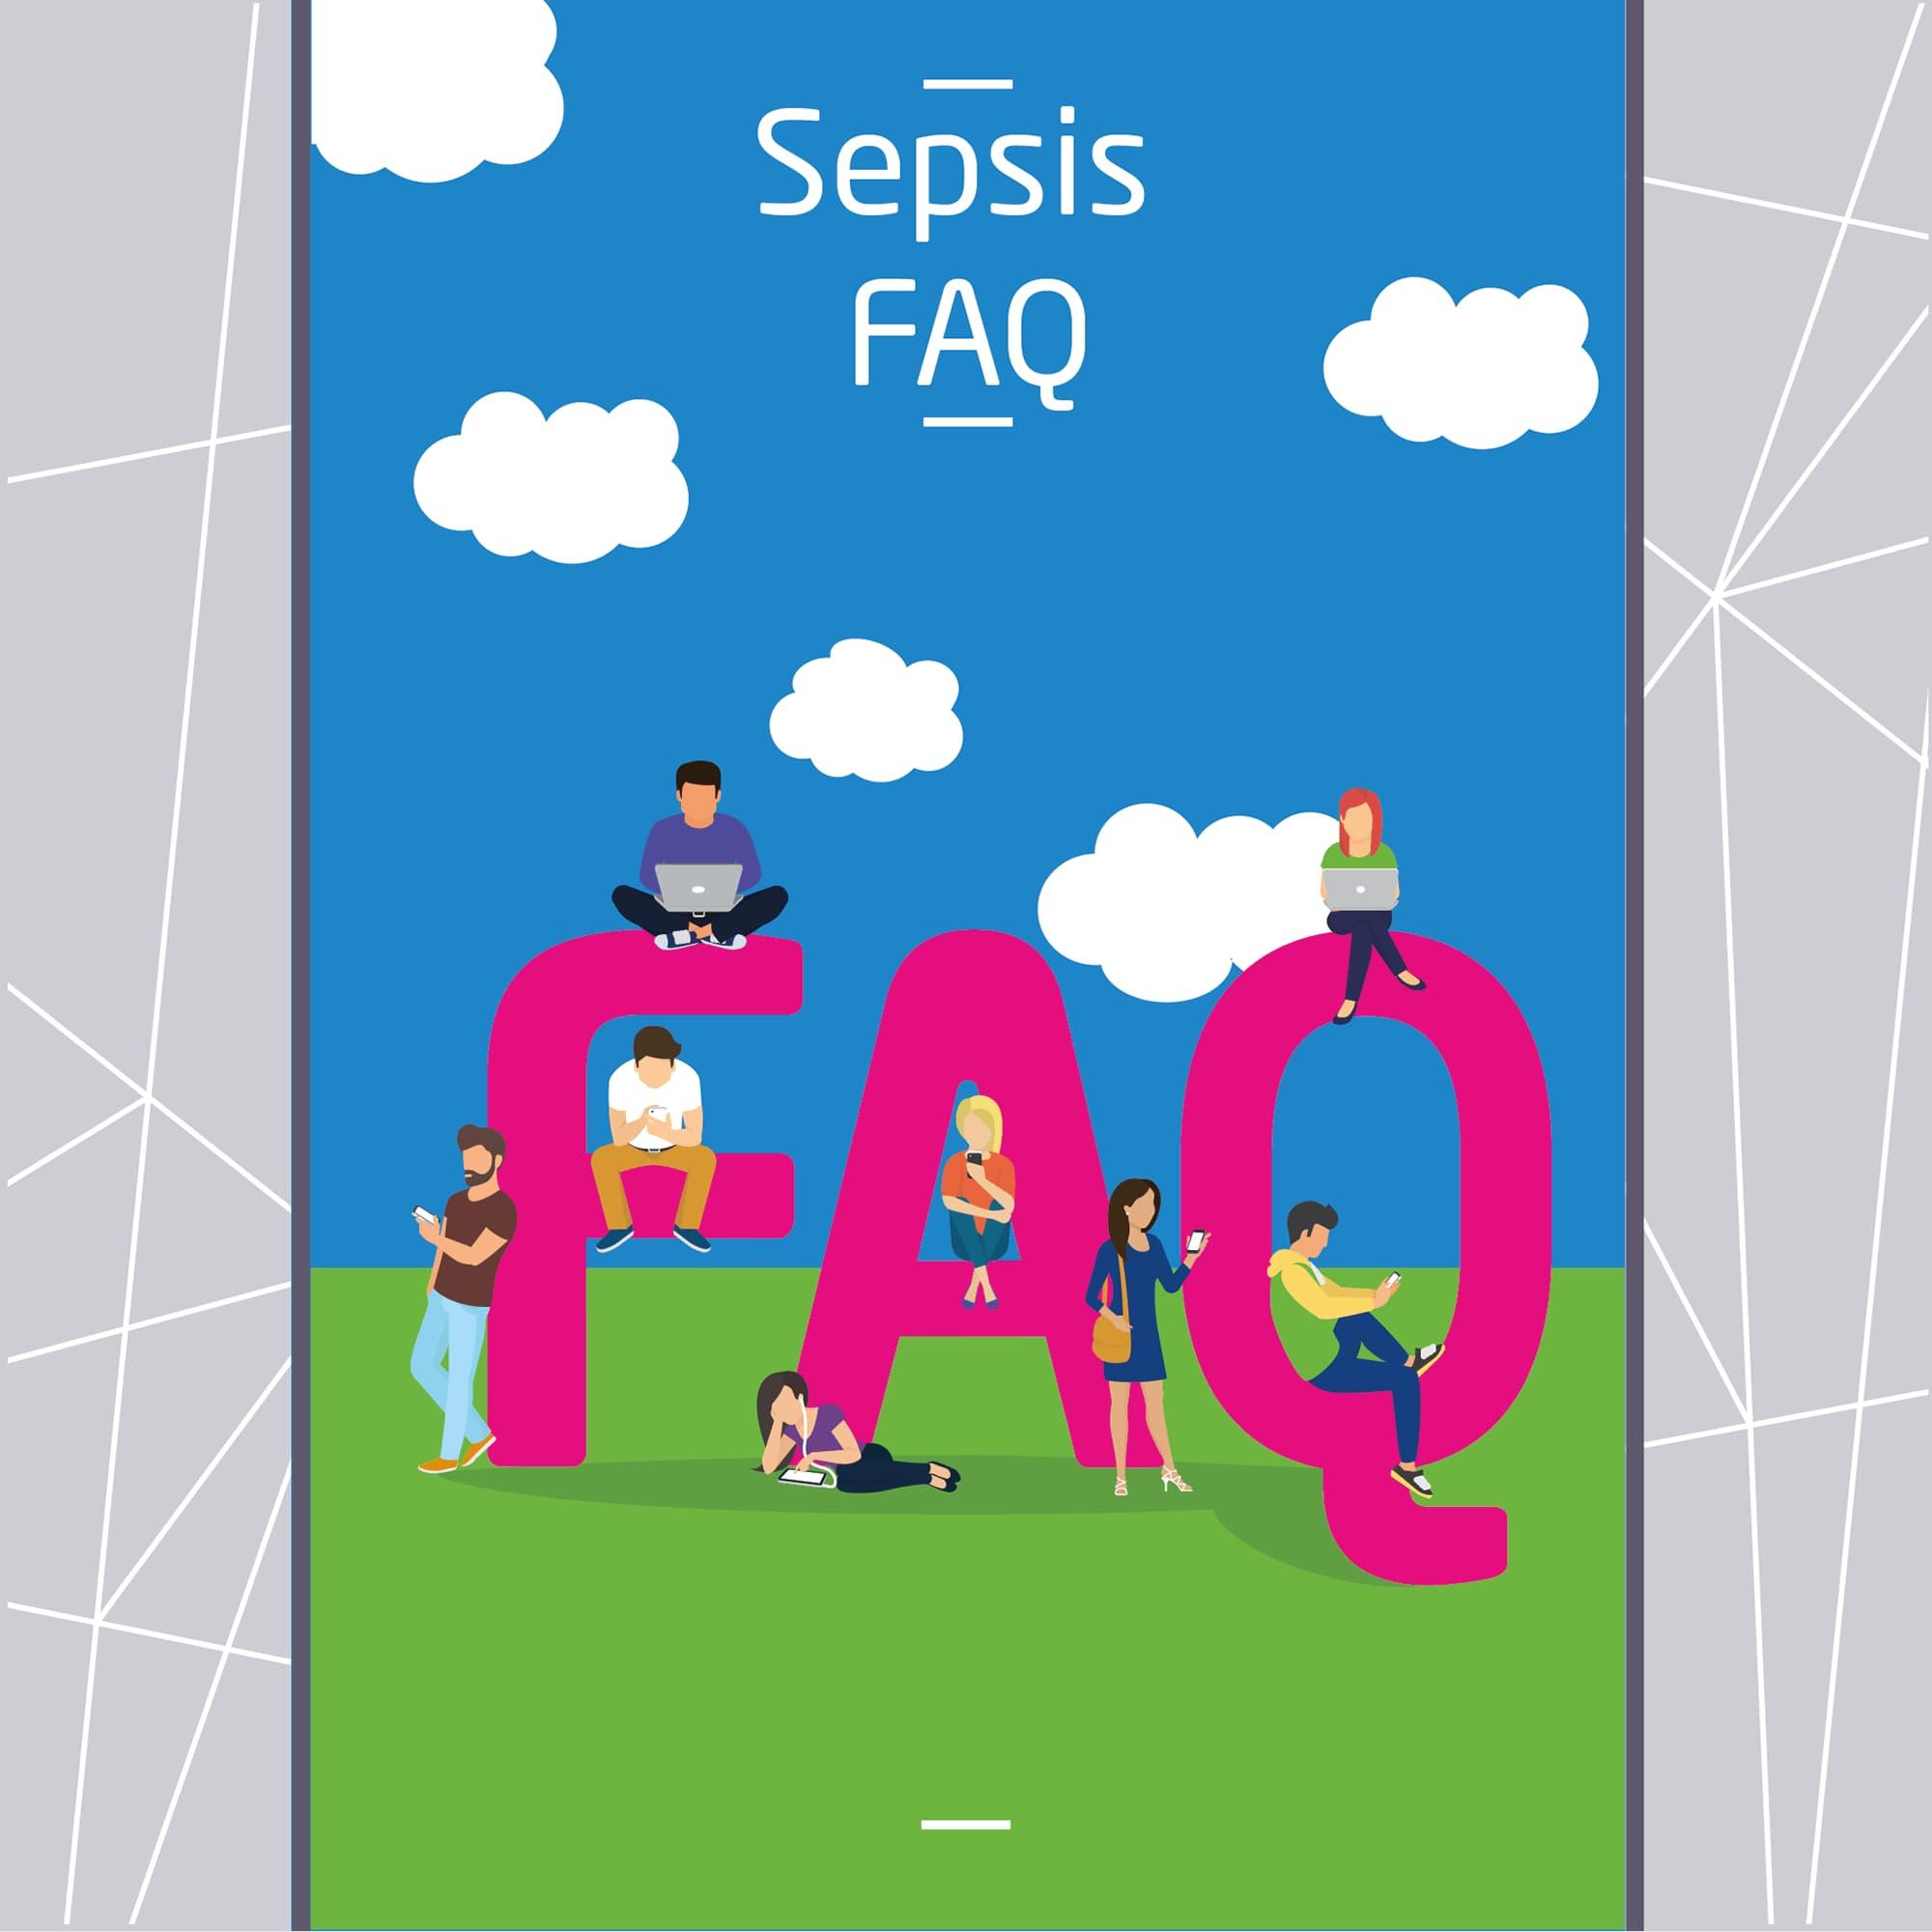 Sepsis FAQ